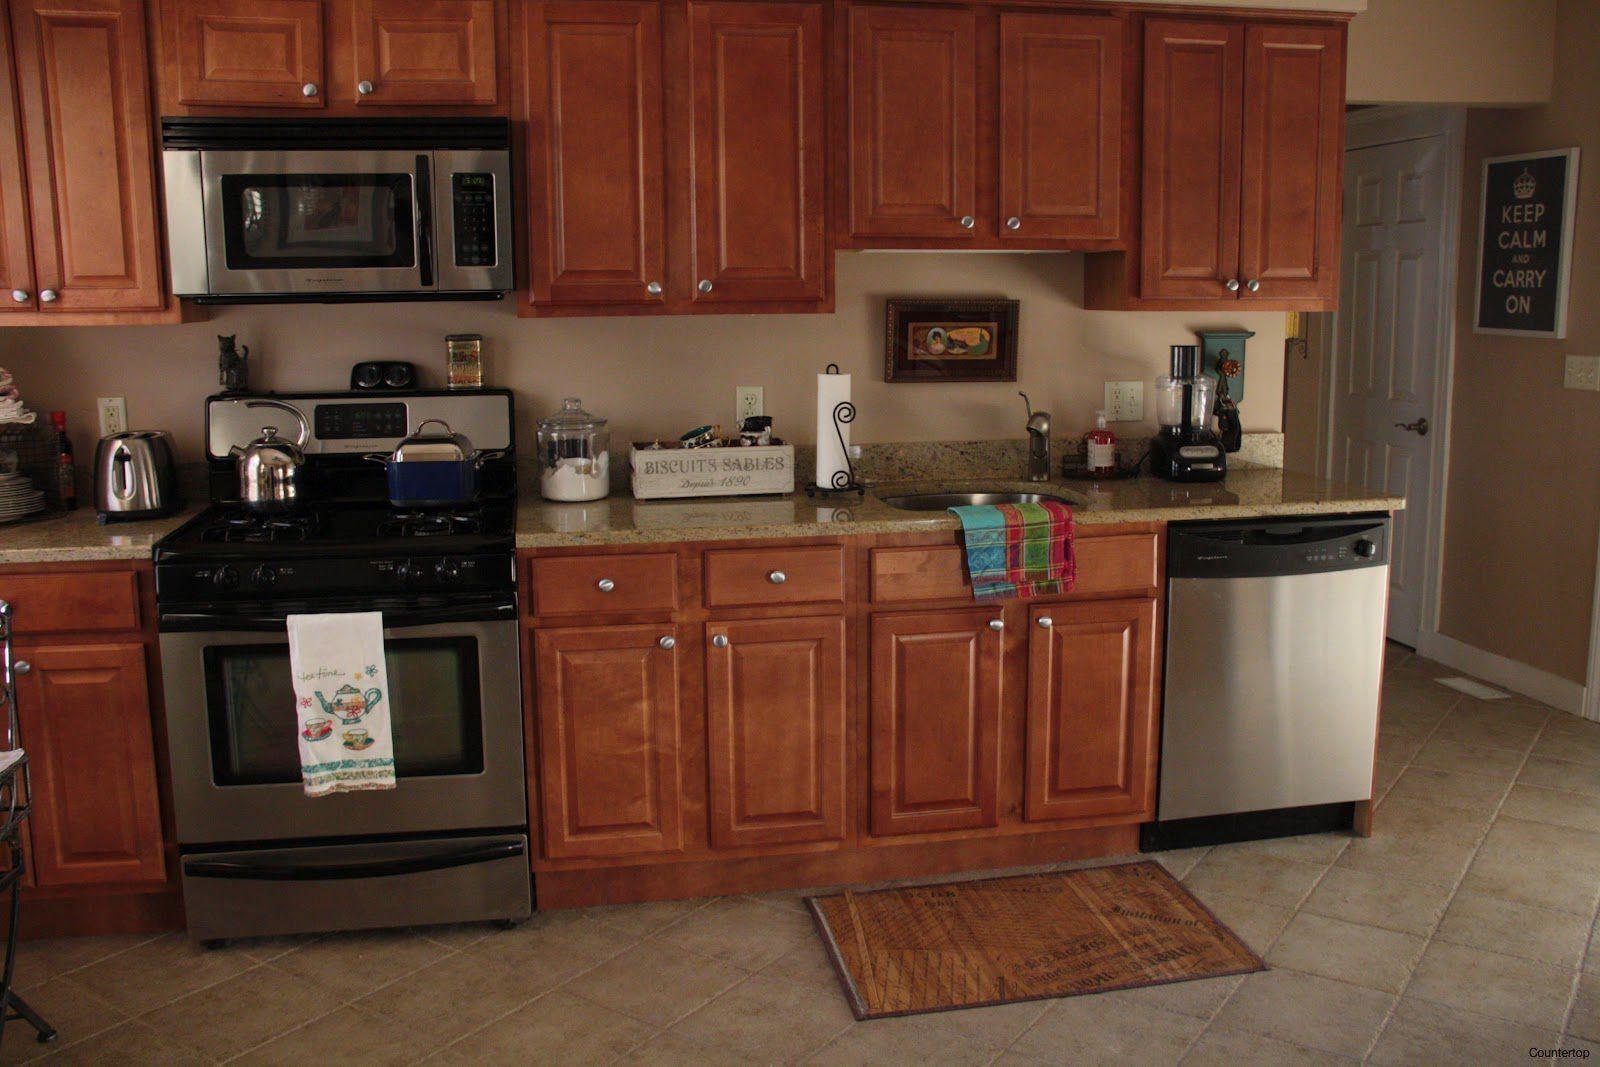 2018 Cheap Granite Countertops Tampa Fl   Unique Kitchen Backsplash Ideas  Check More At Http: